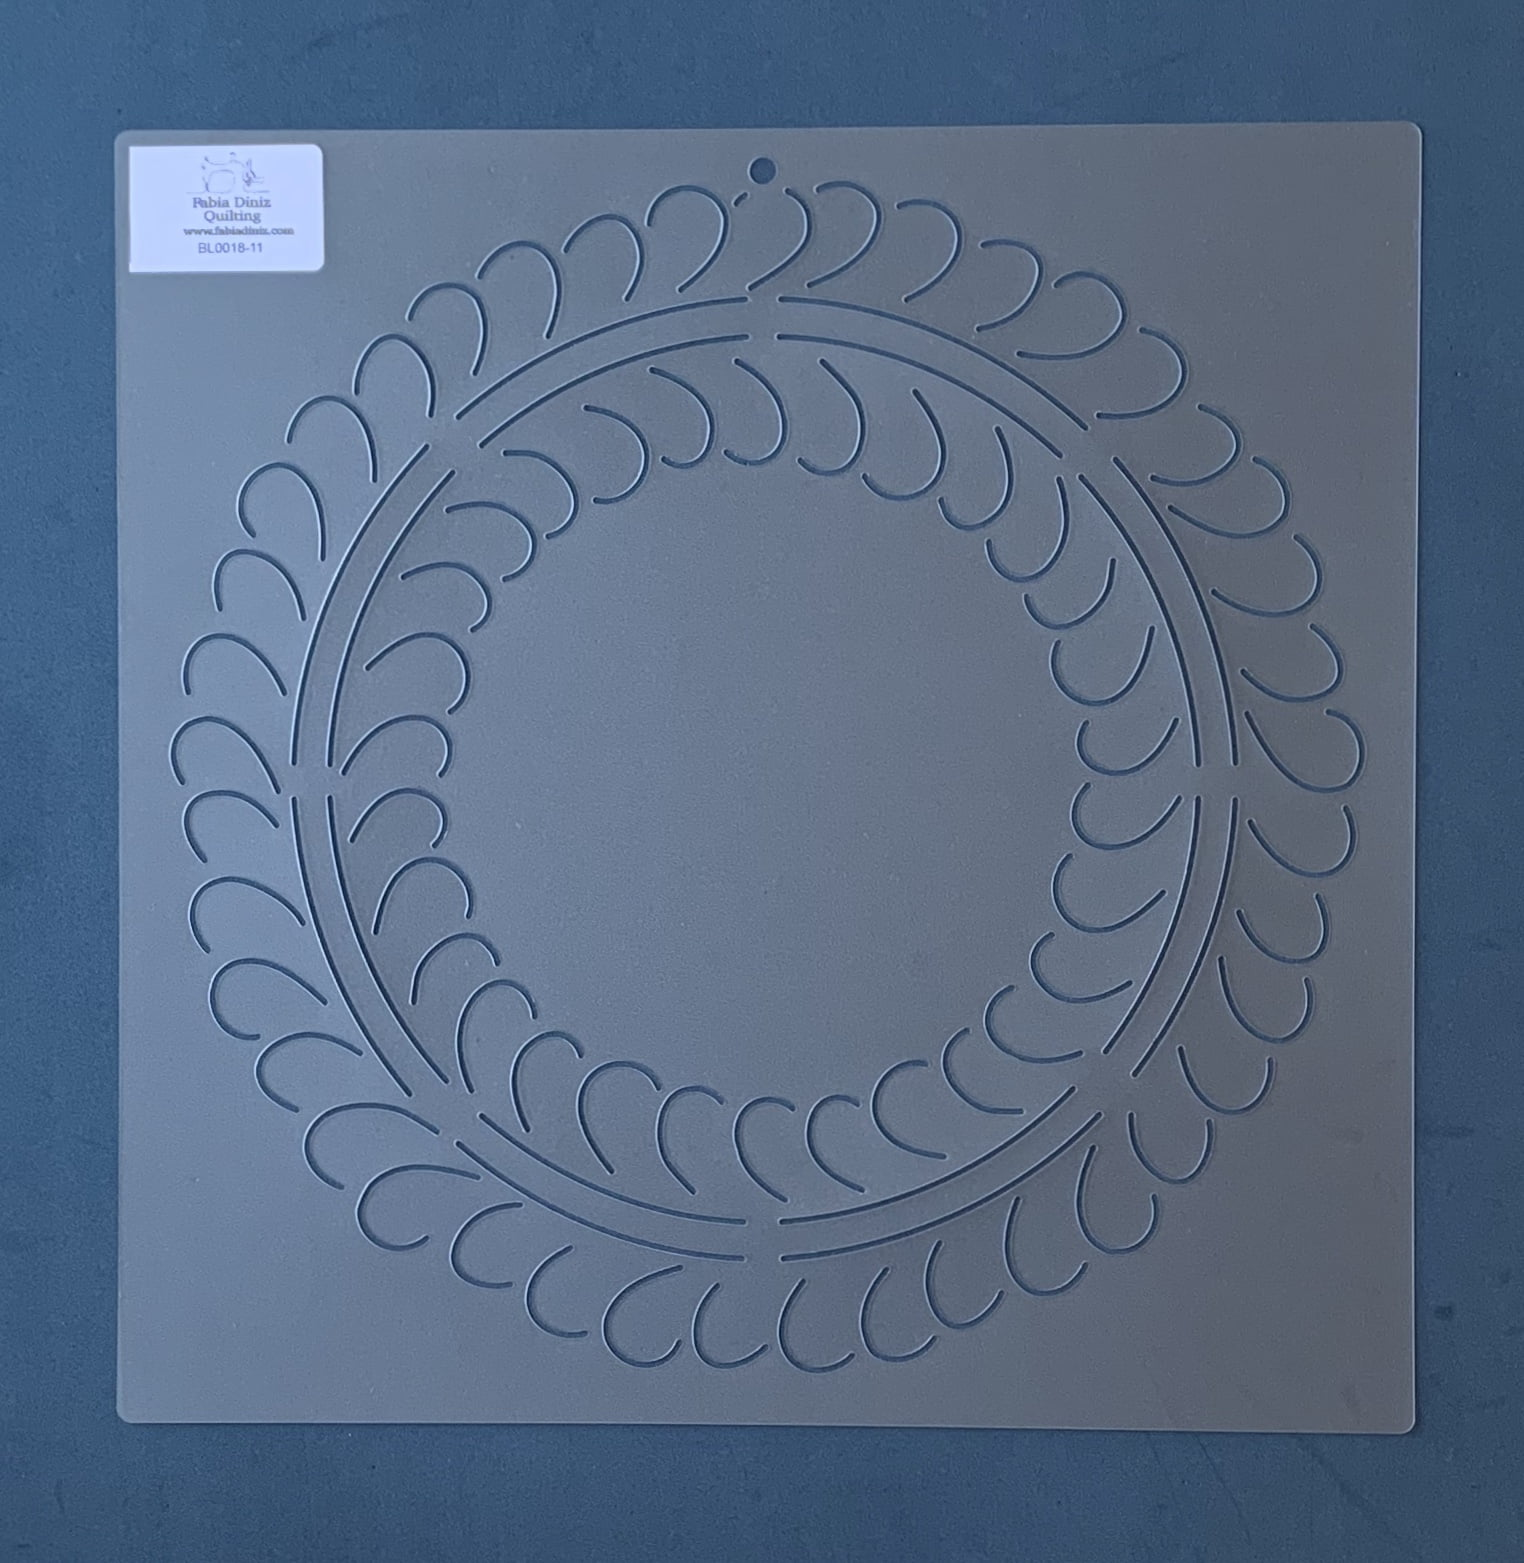 Stencil Bloco Plumas BL-0018-11 30,5 x 30,5 cm